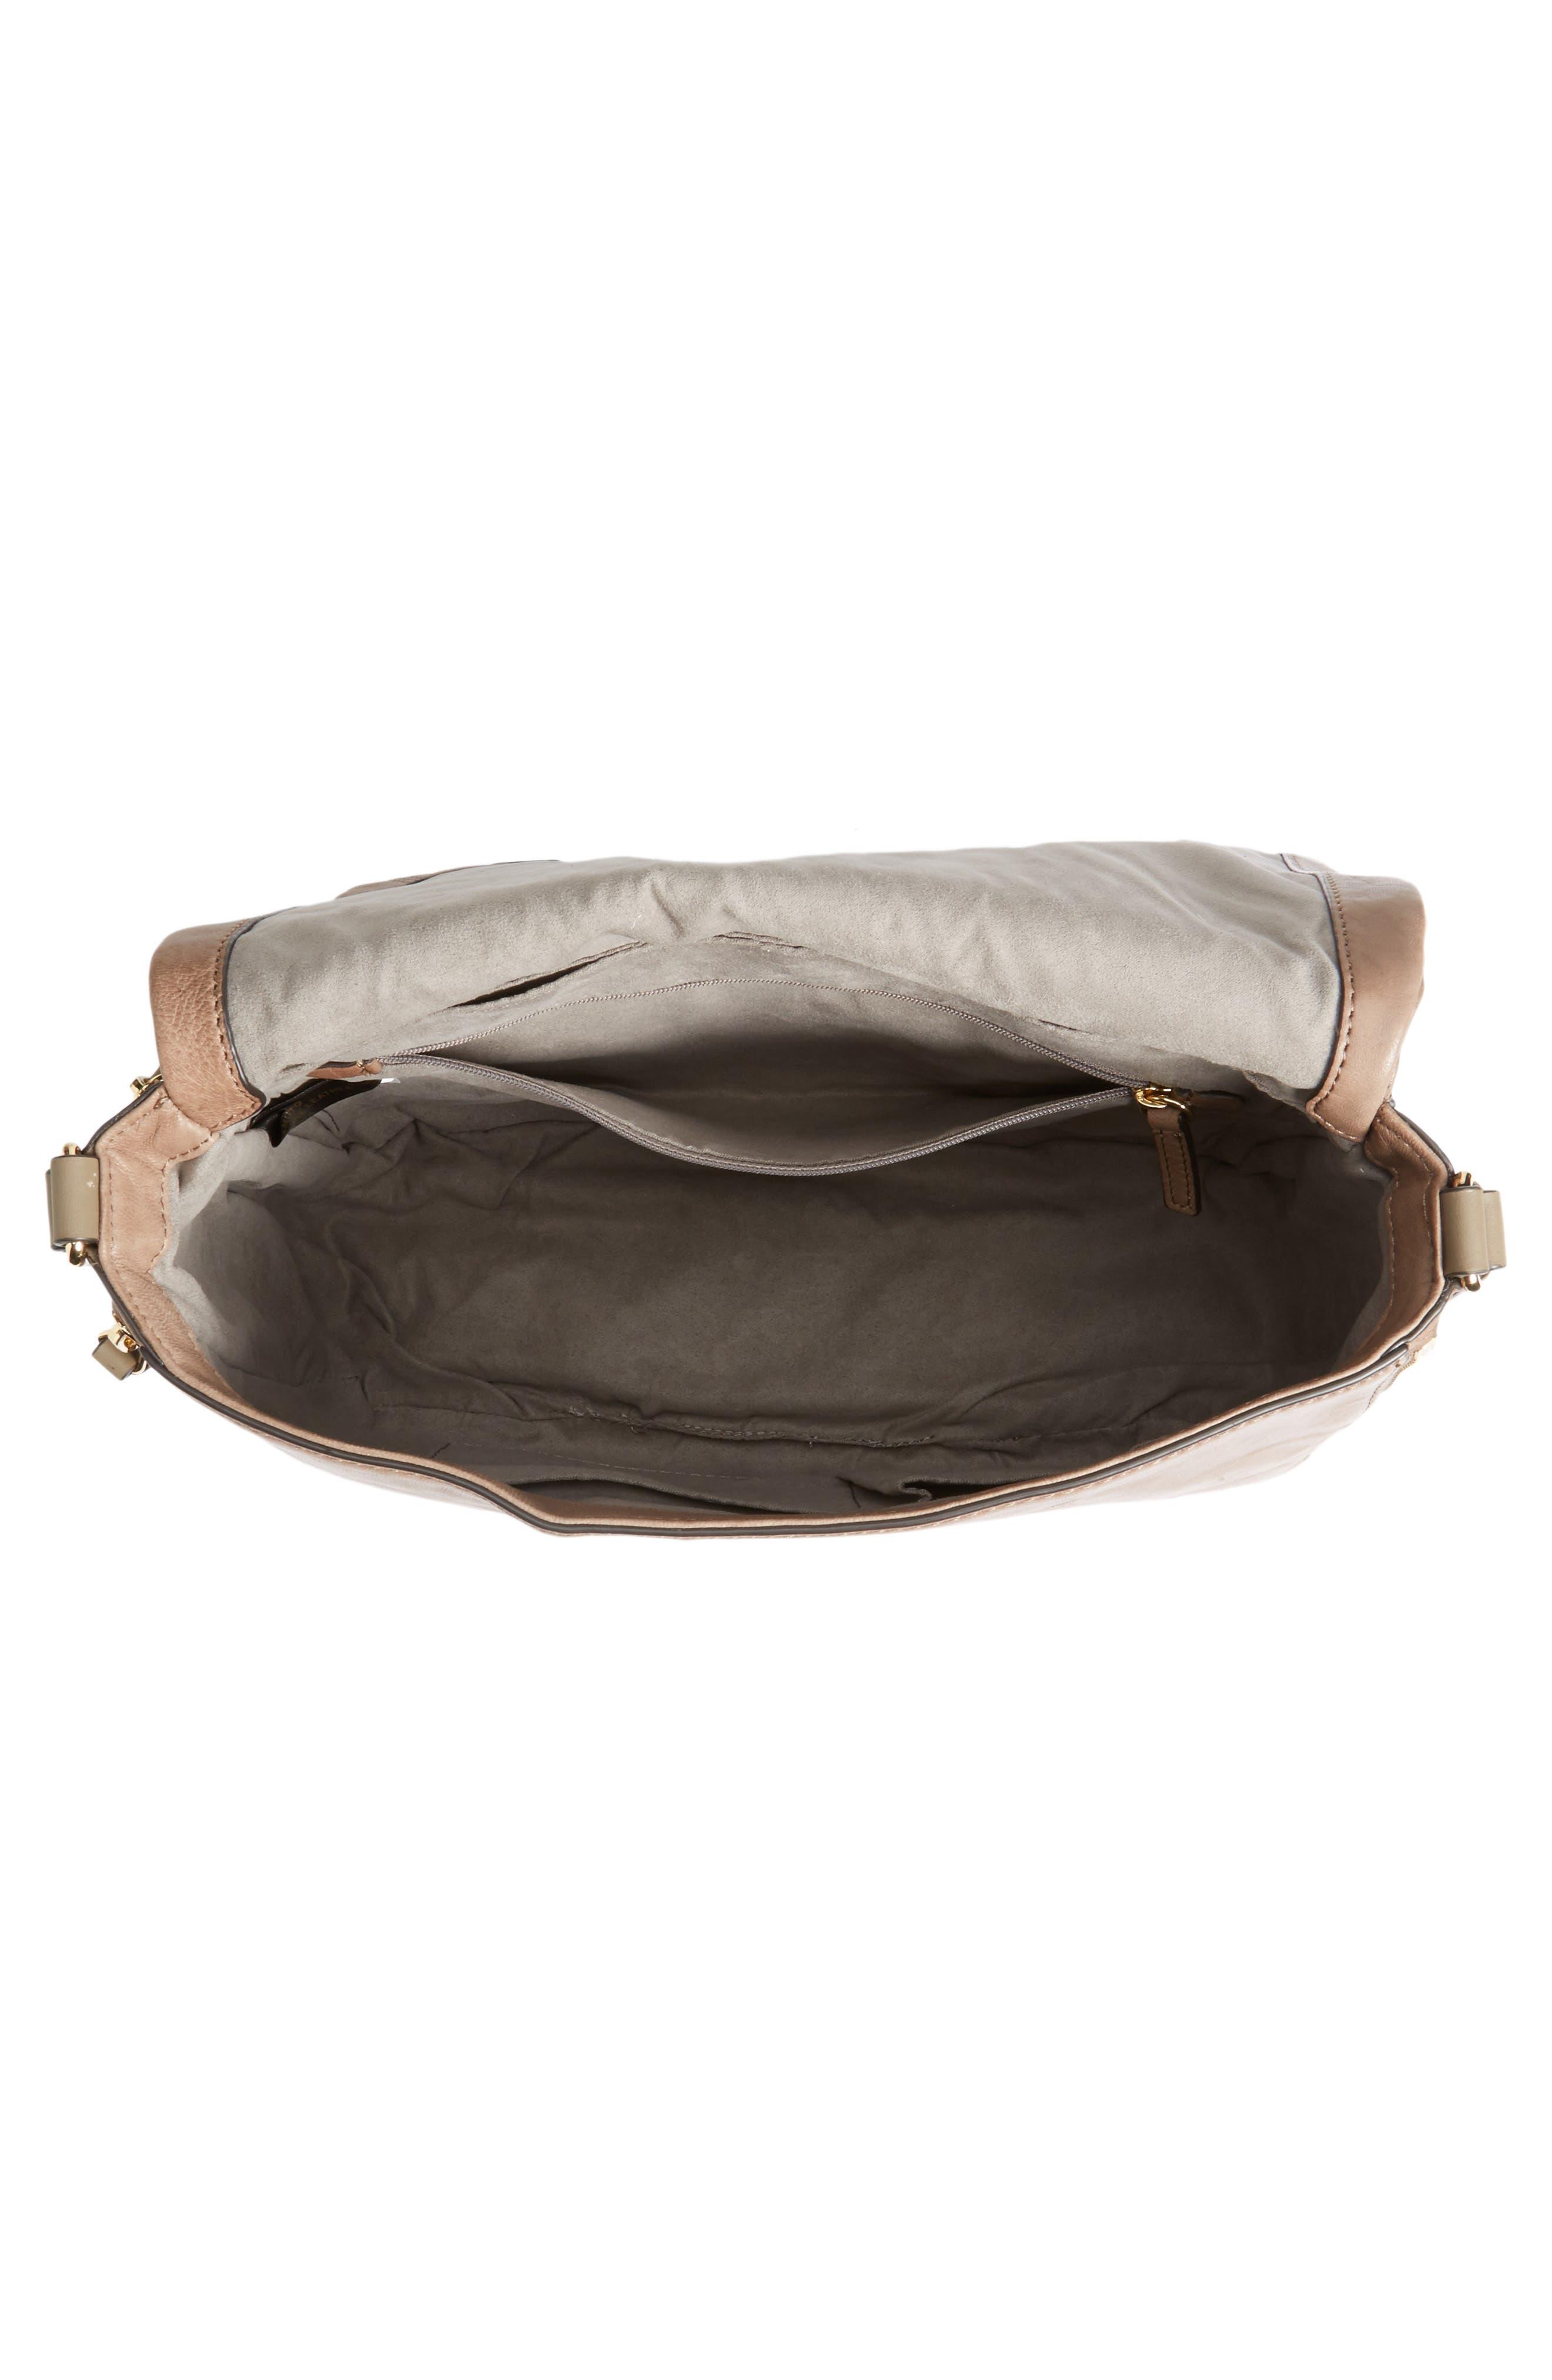 Alternate Image 3  - Vince Camuto Delos Leather Messenger Bag (Nordstrom Exclusive)